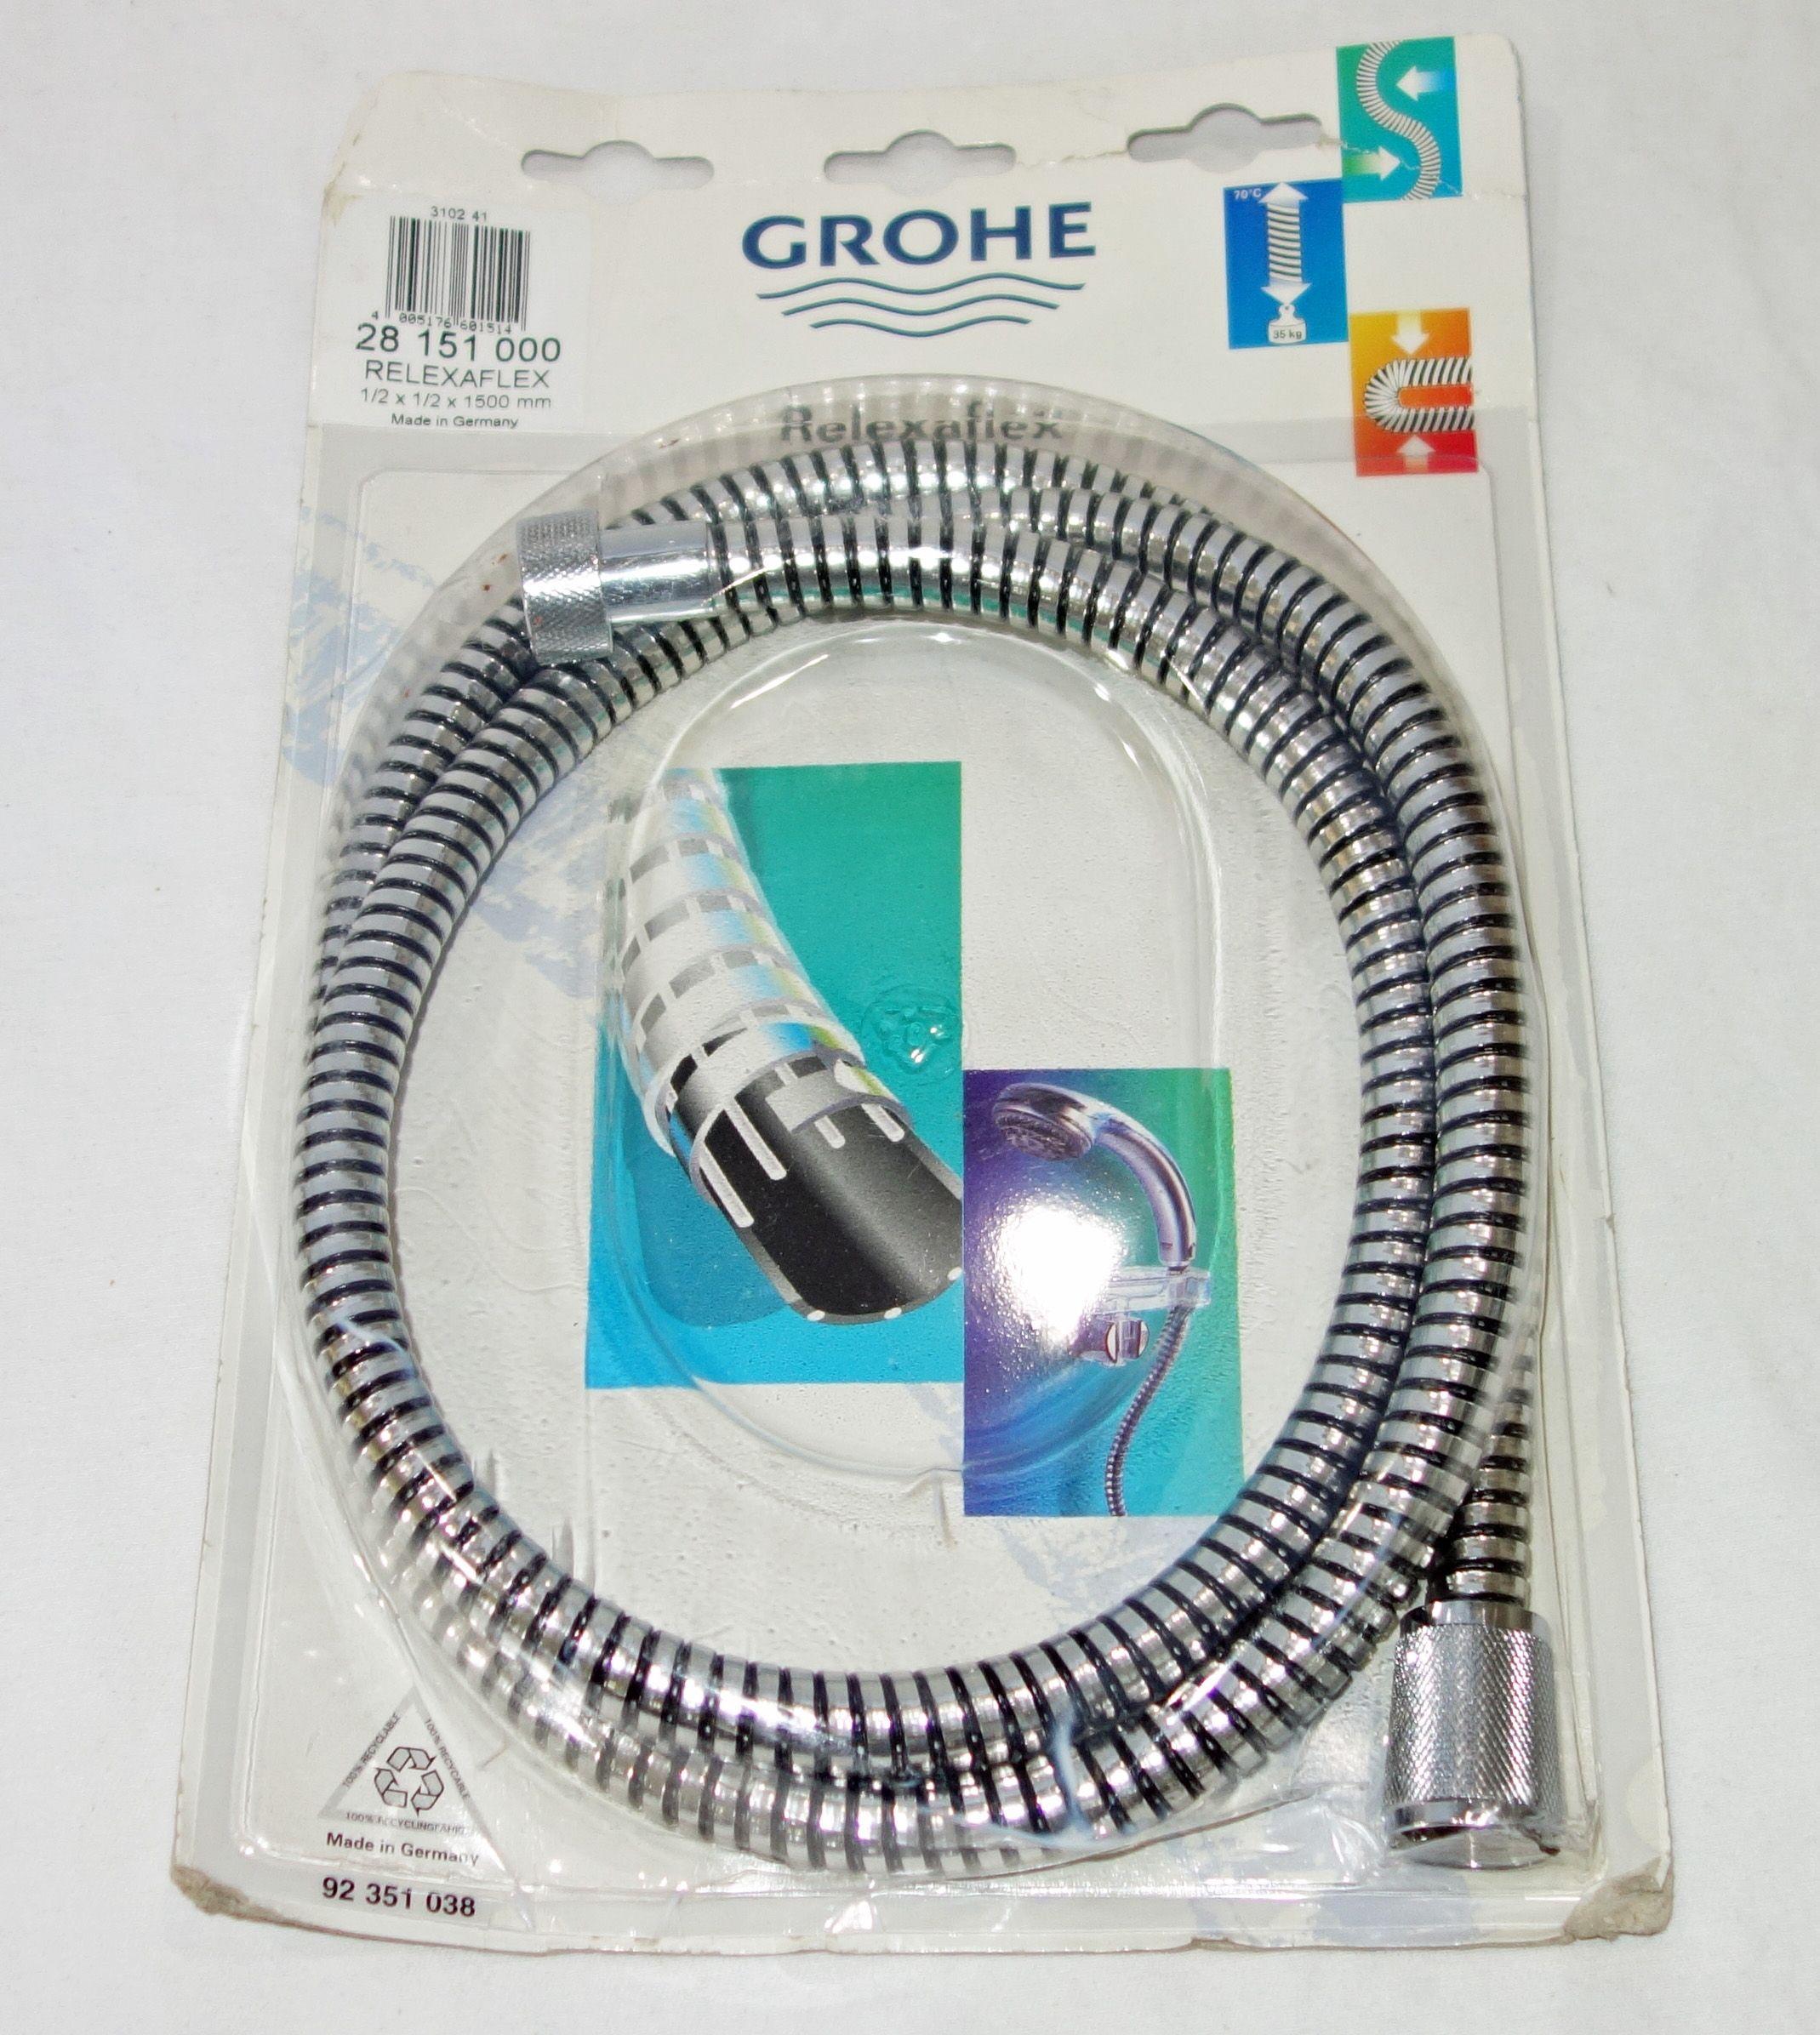 Grohe Relexaflex Shower Hose - Starlight Chrome - 28151000 ...